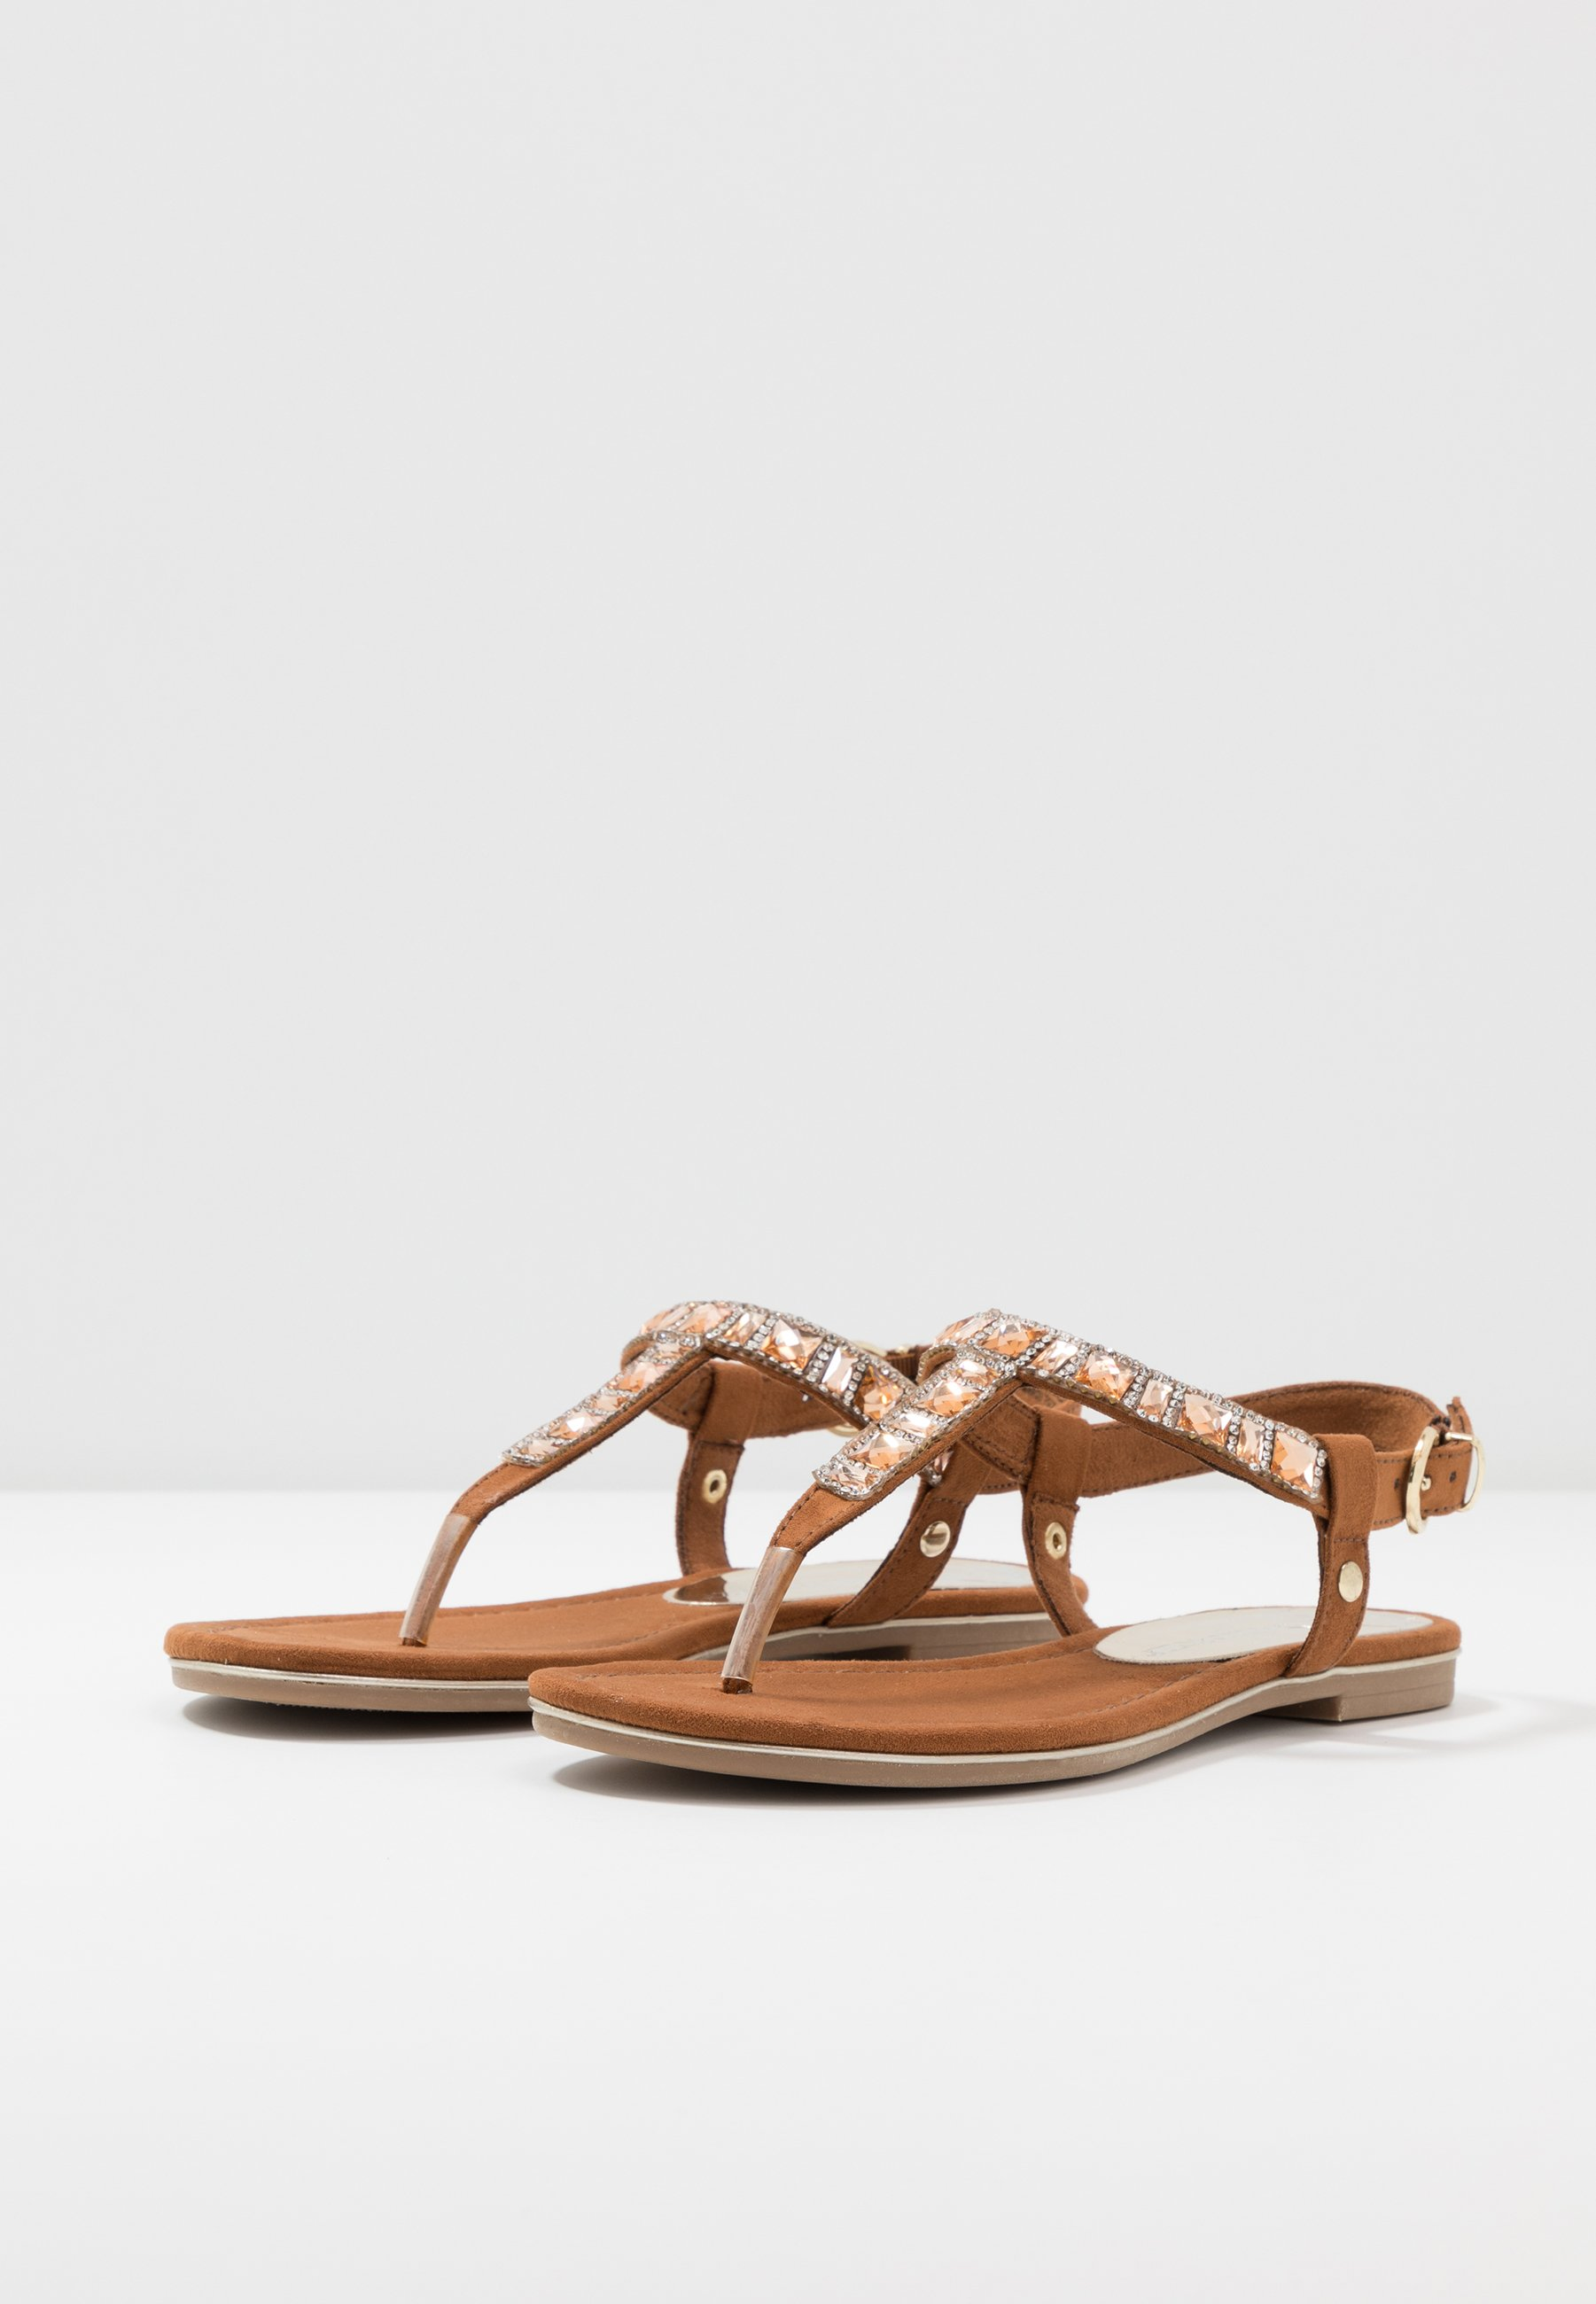 Marco Tozzi T-bar Sandals - Cognac